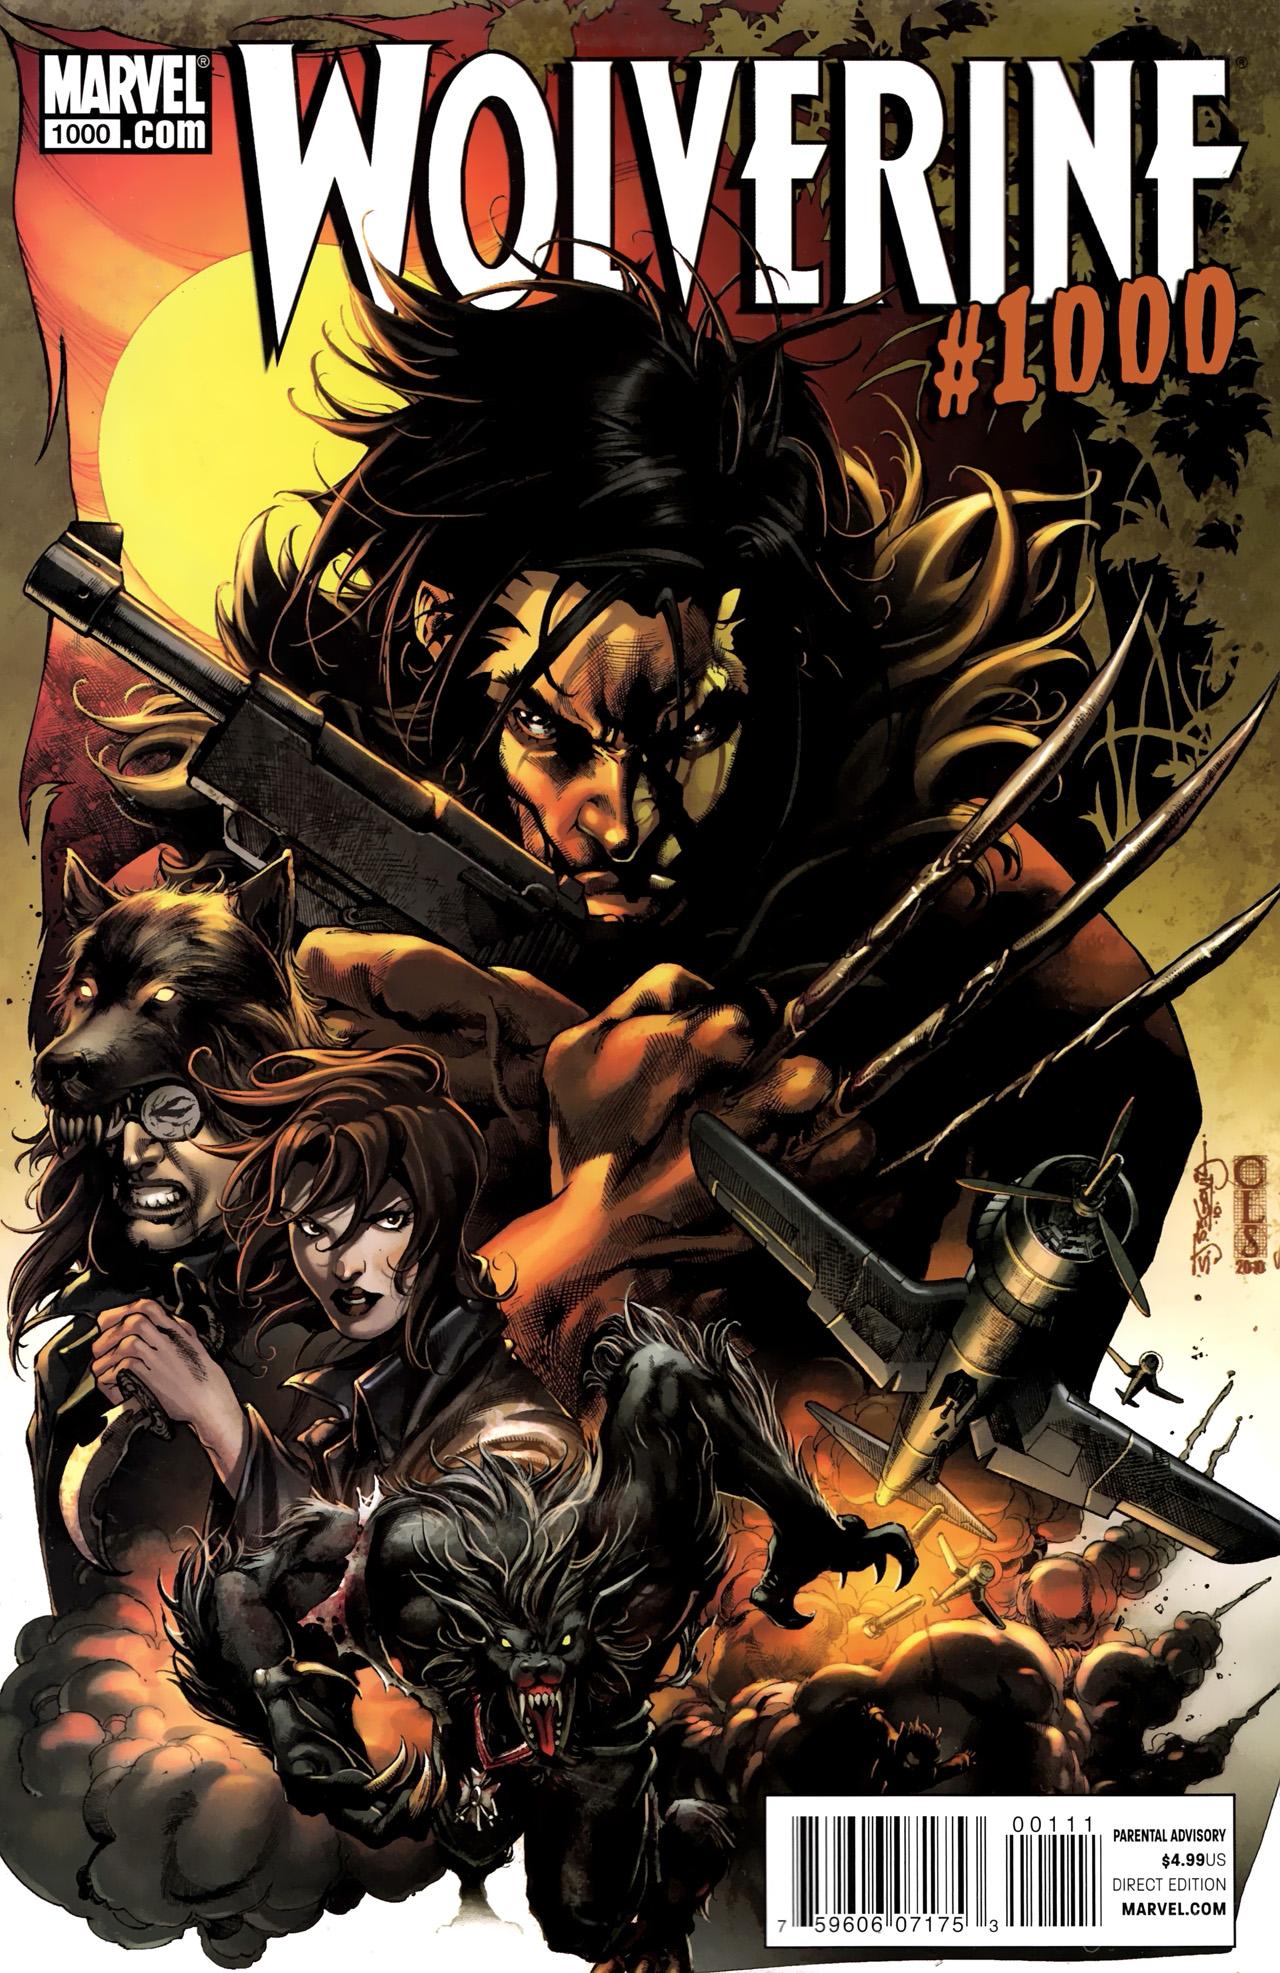 Wolverine (2010) 1000 Page 1